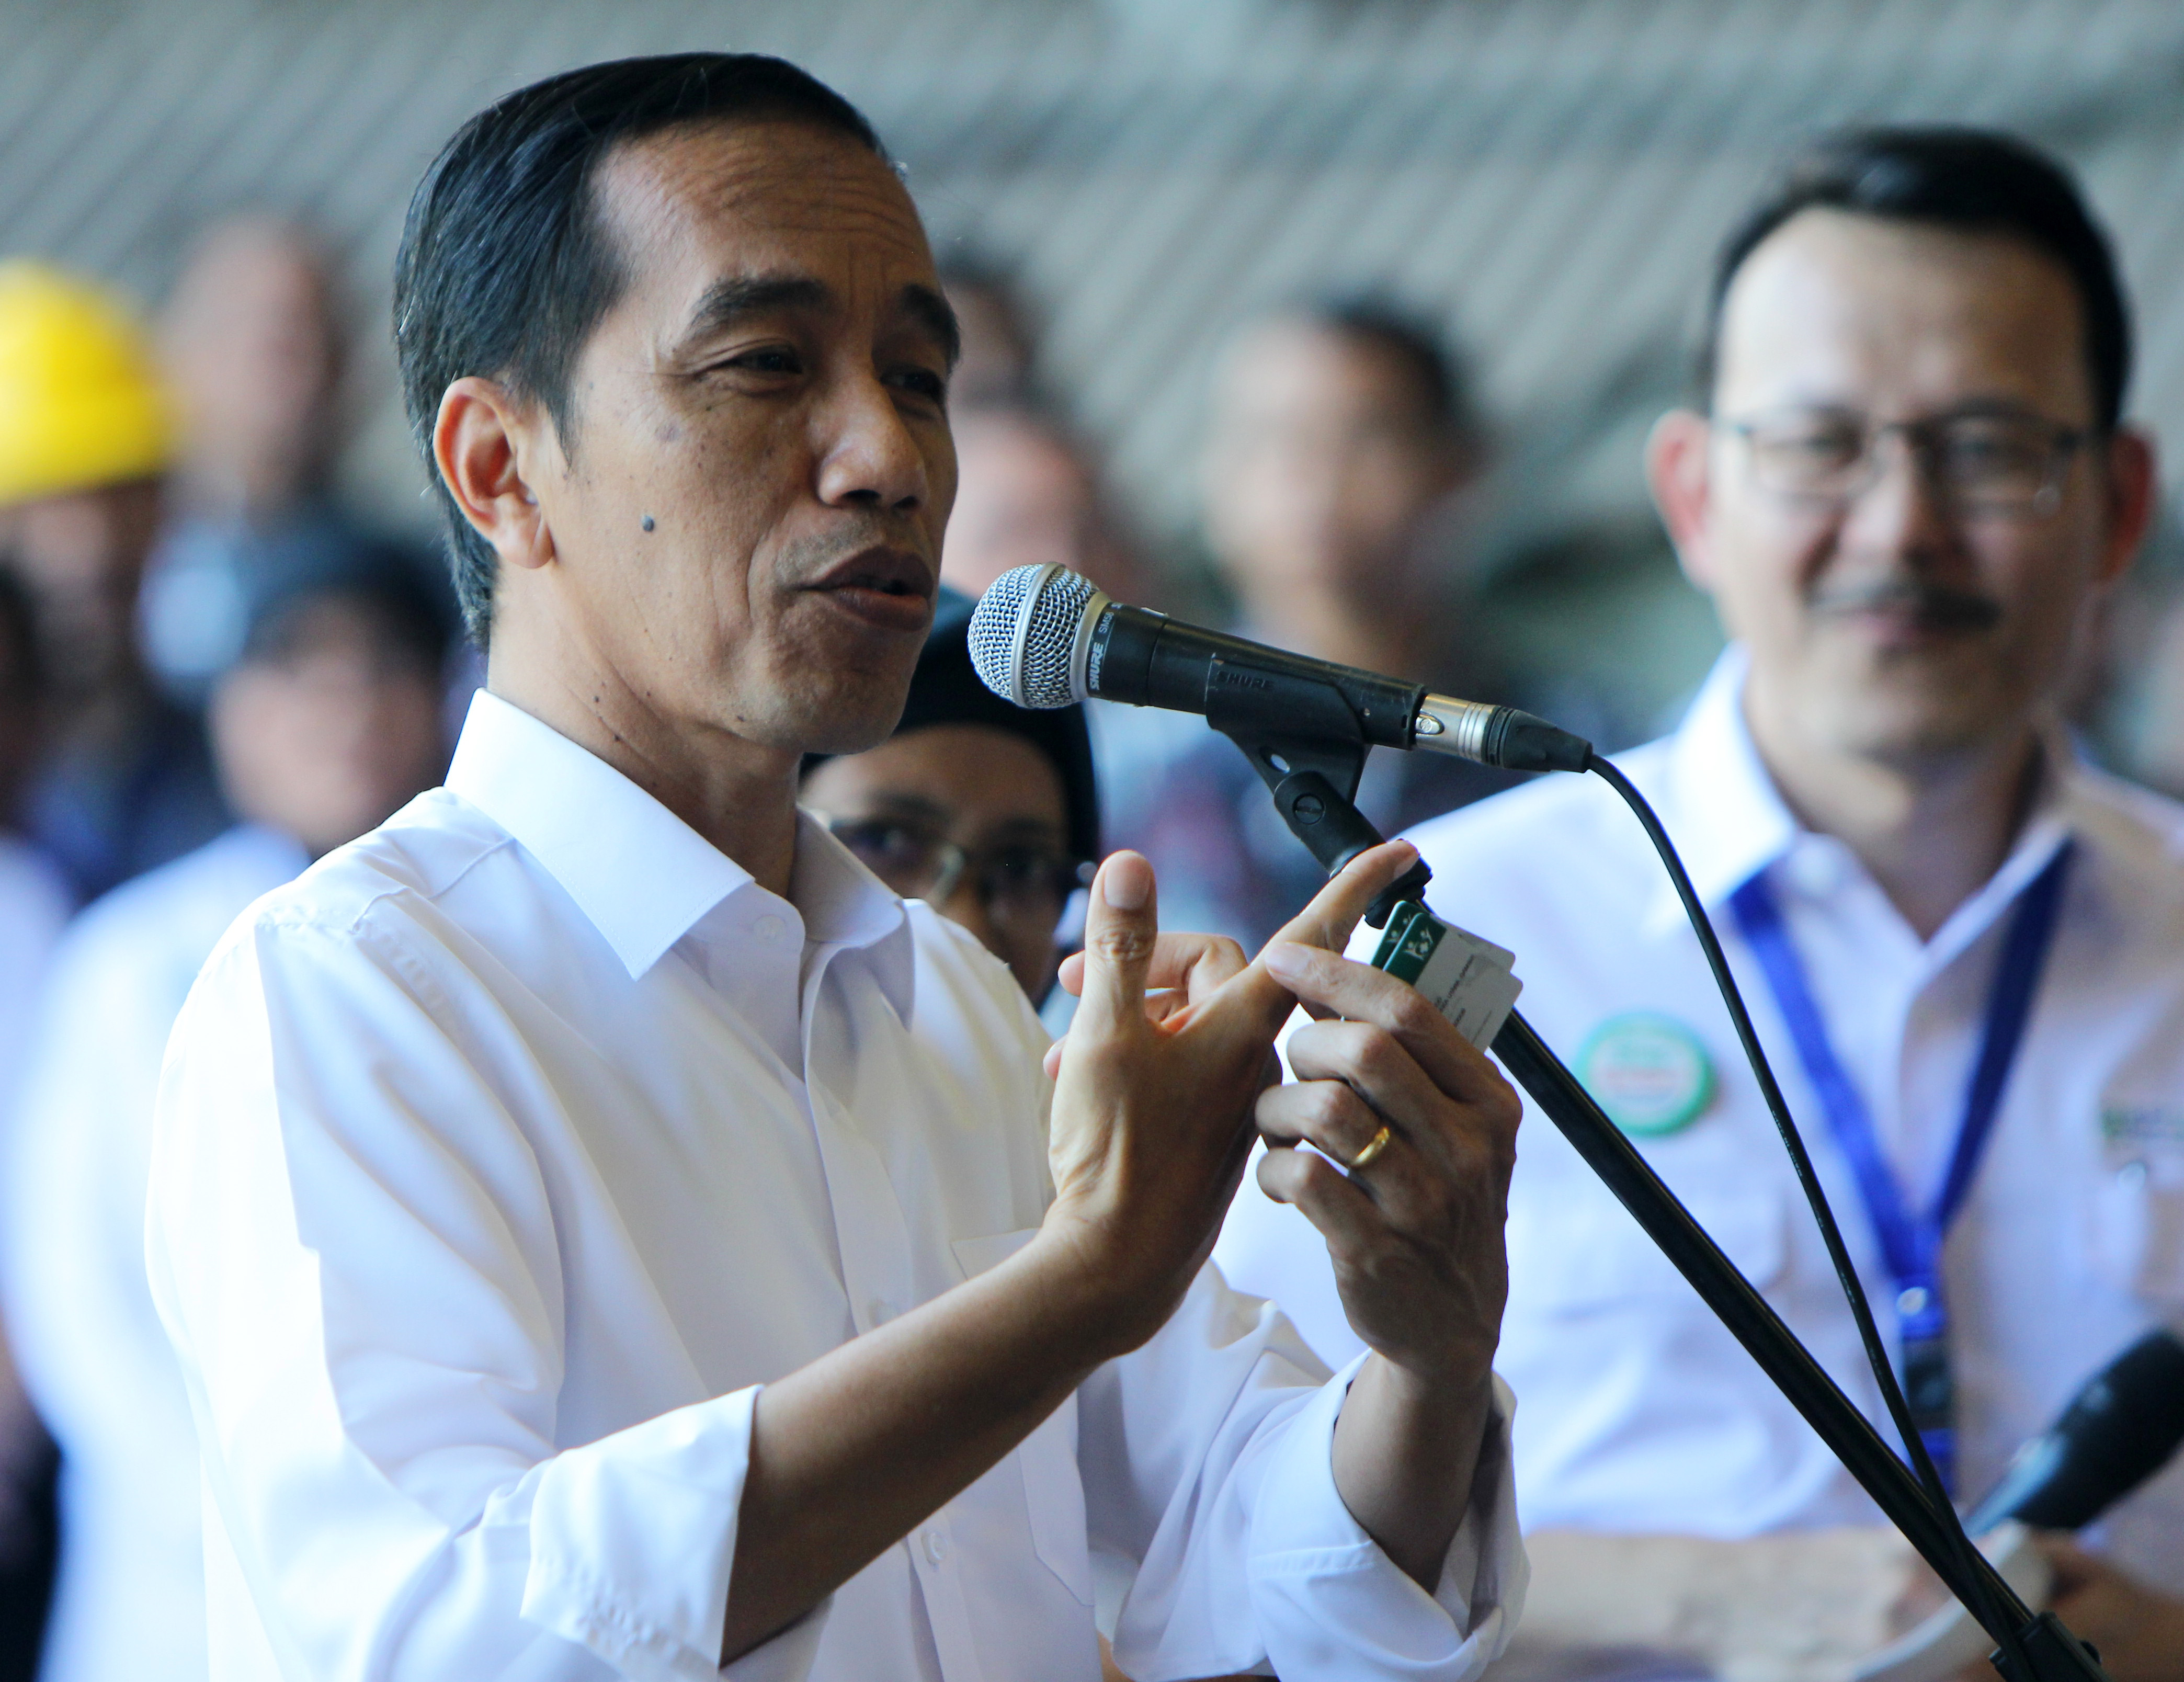 Presiden Jokowi saat penyerahan Kartu Indonesia Sehat sebanyak 88,2 juta kartu dan Kartu Indonesia Pintar sebanyak 20,3 juta kartu